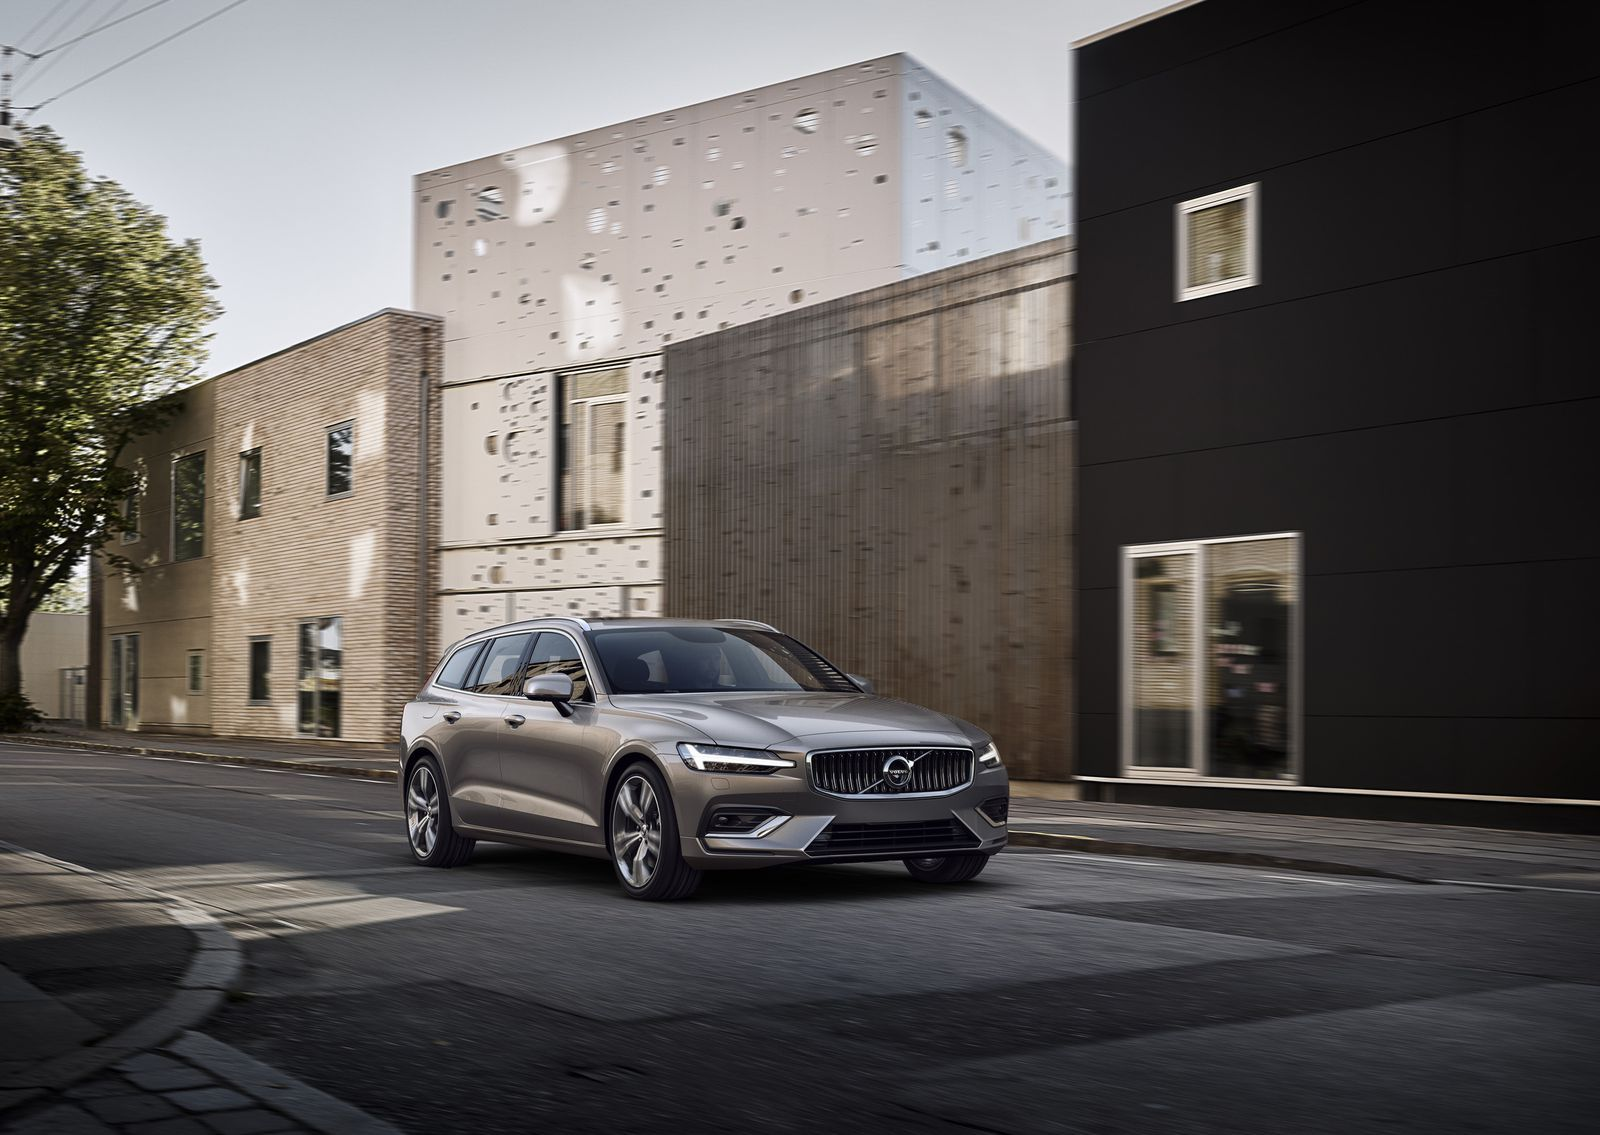 2019 Volvo V60 It S Wagontime Volvo V60 Volvo Cars Volvo